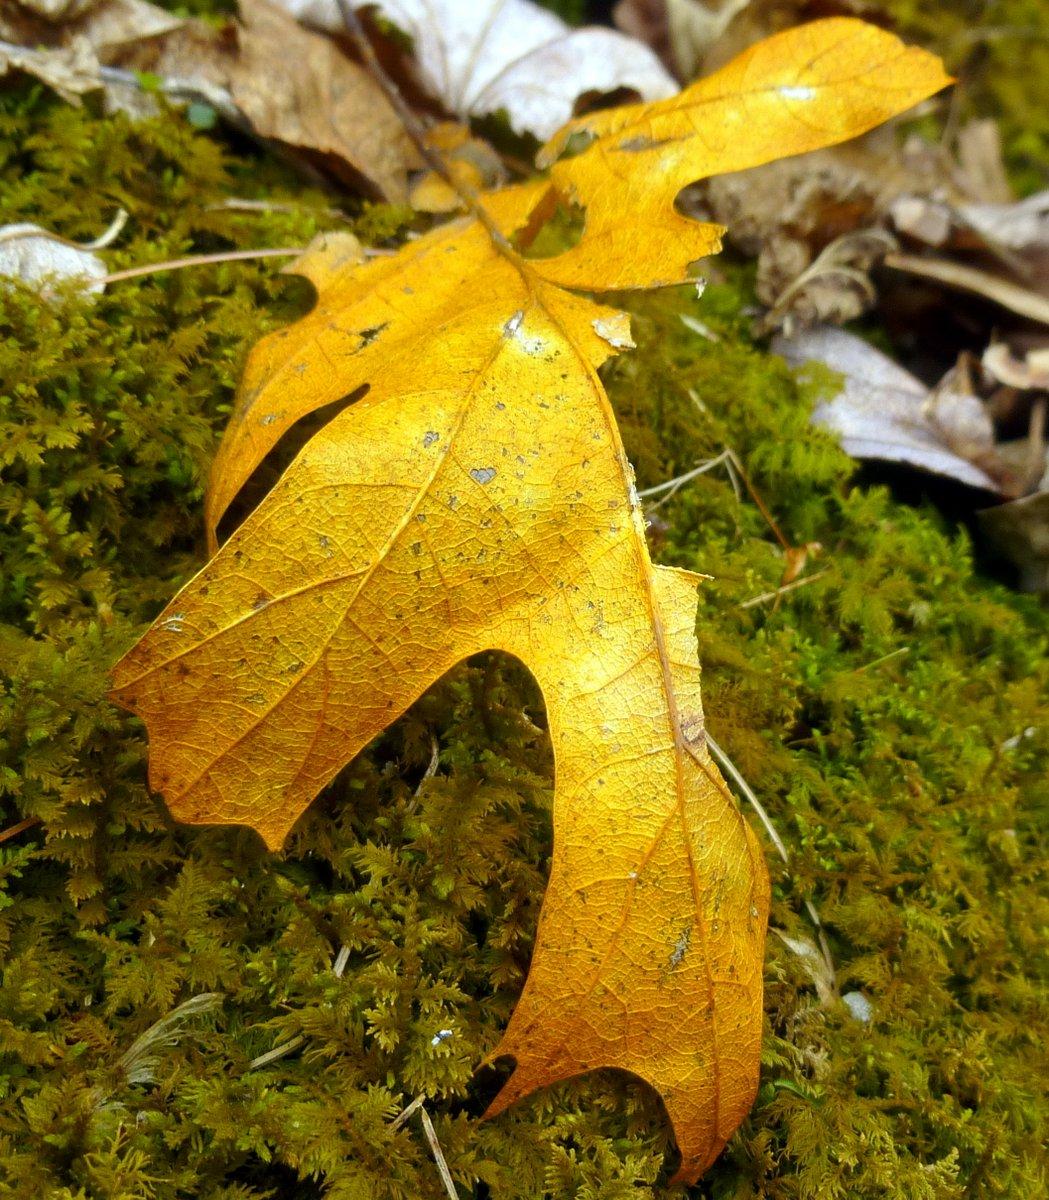 14. Orange Oak Leaf